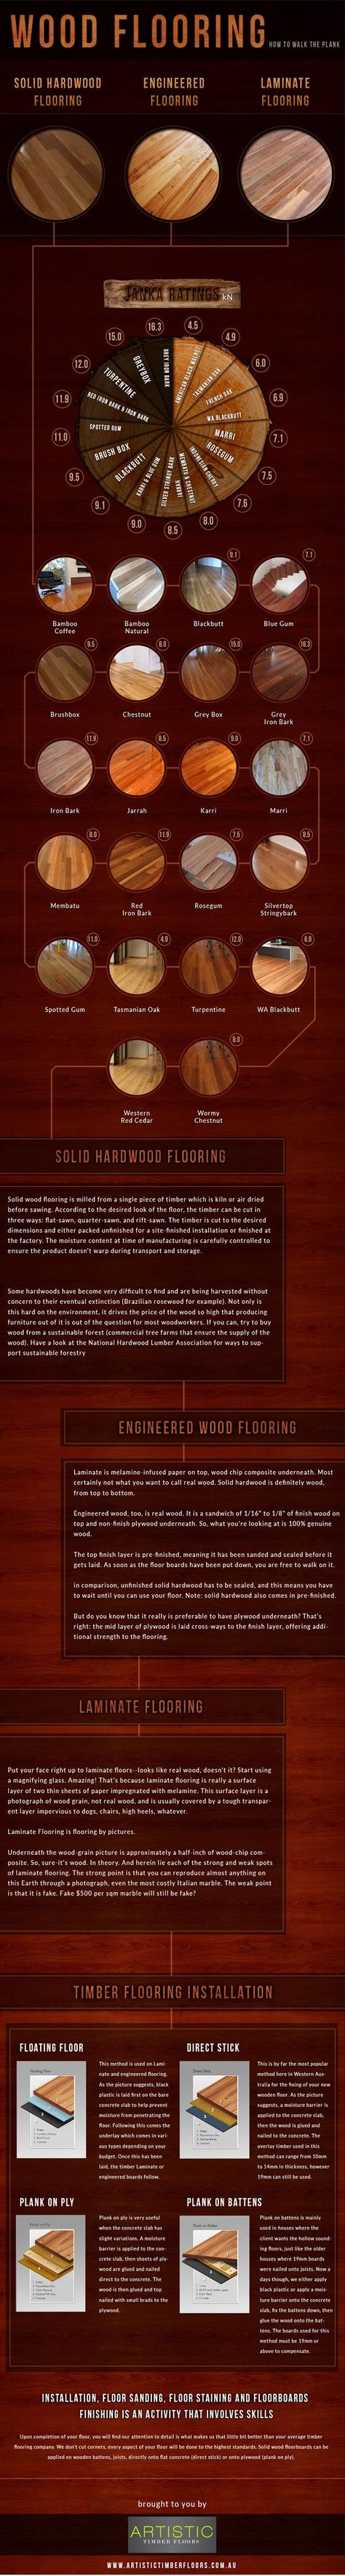 Best 25+ Wood flooring types ideas on Pinterest | Hardwood types ...